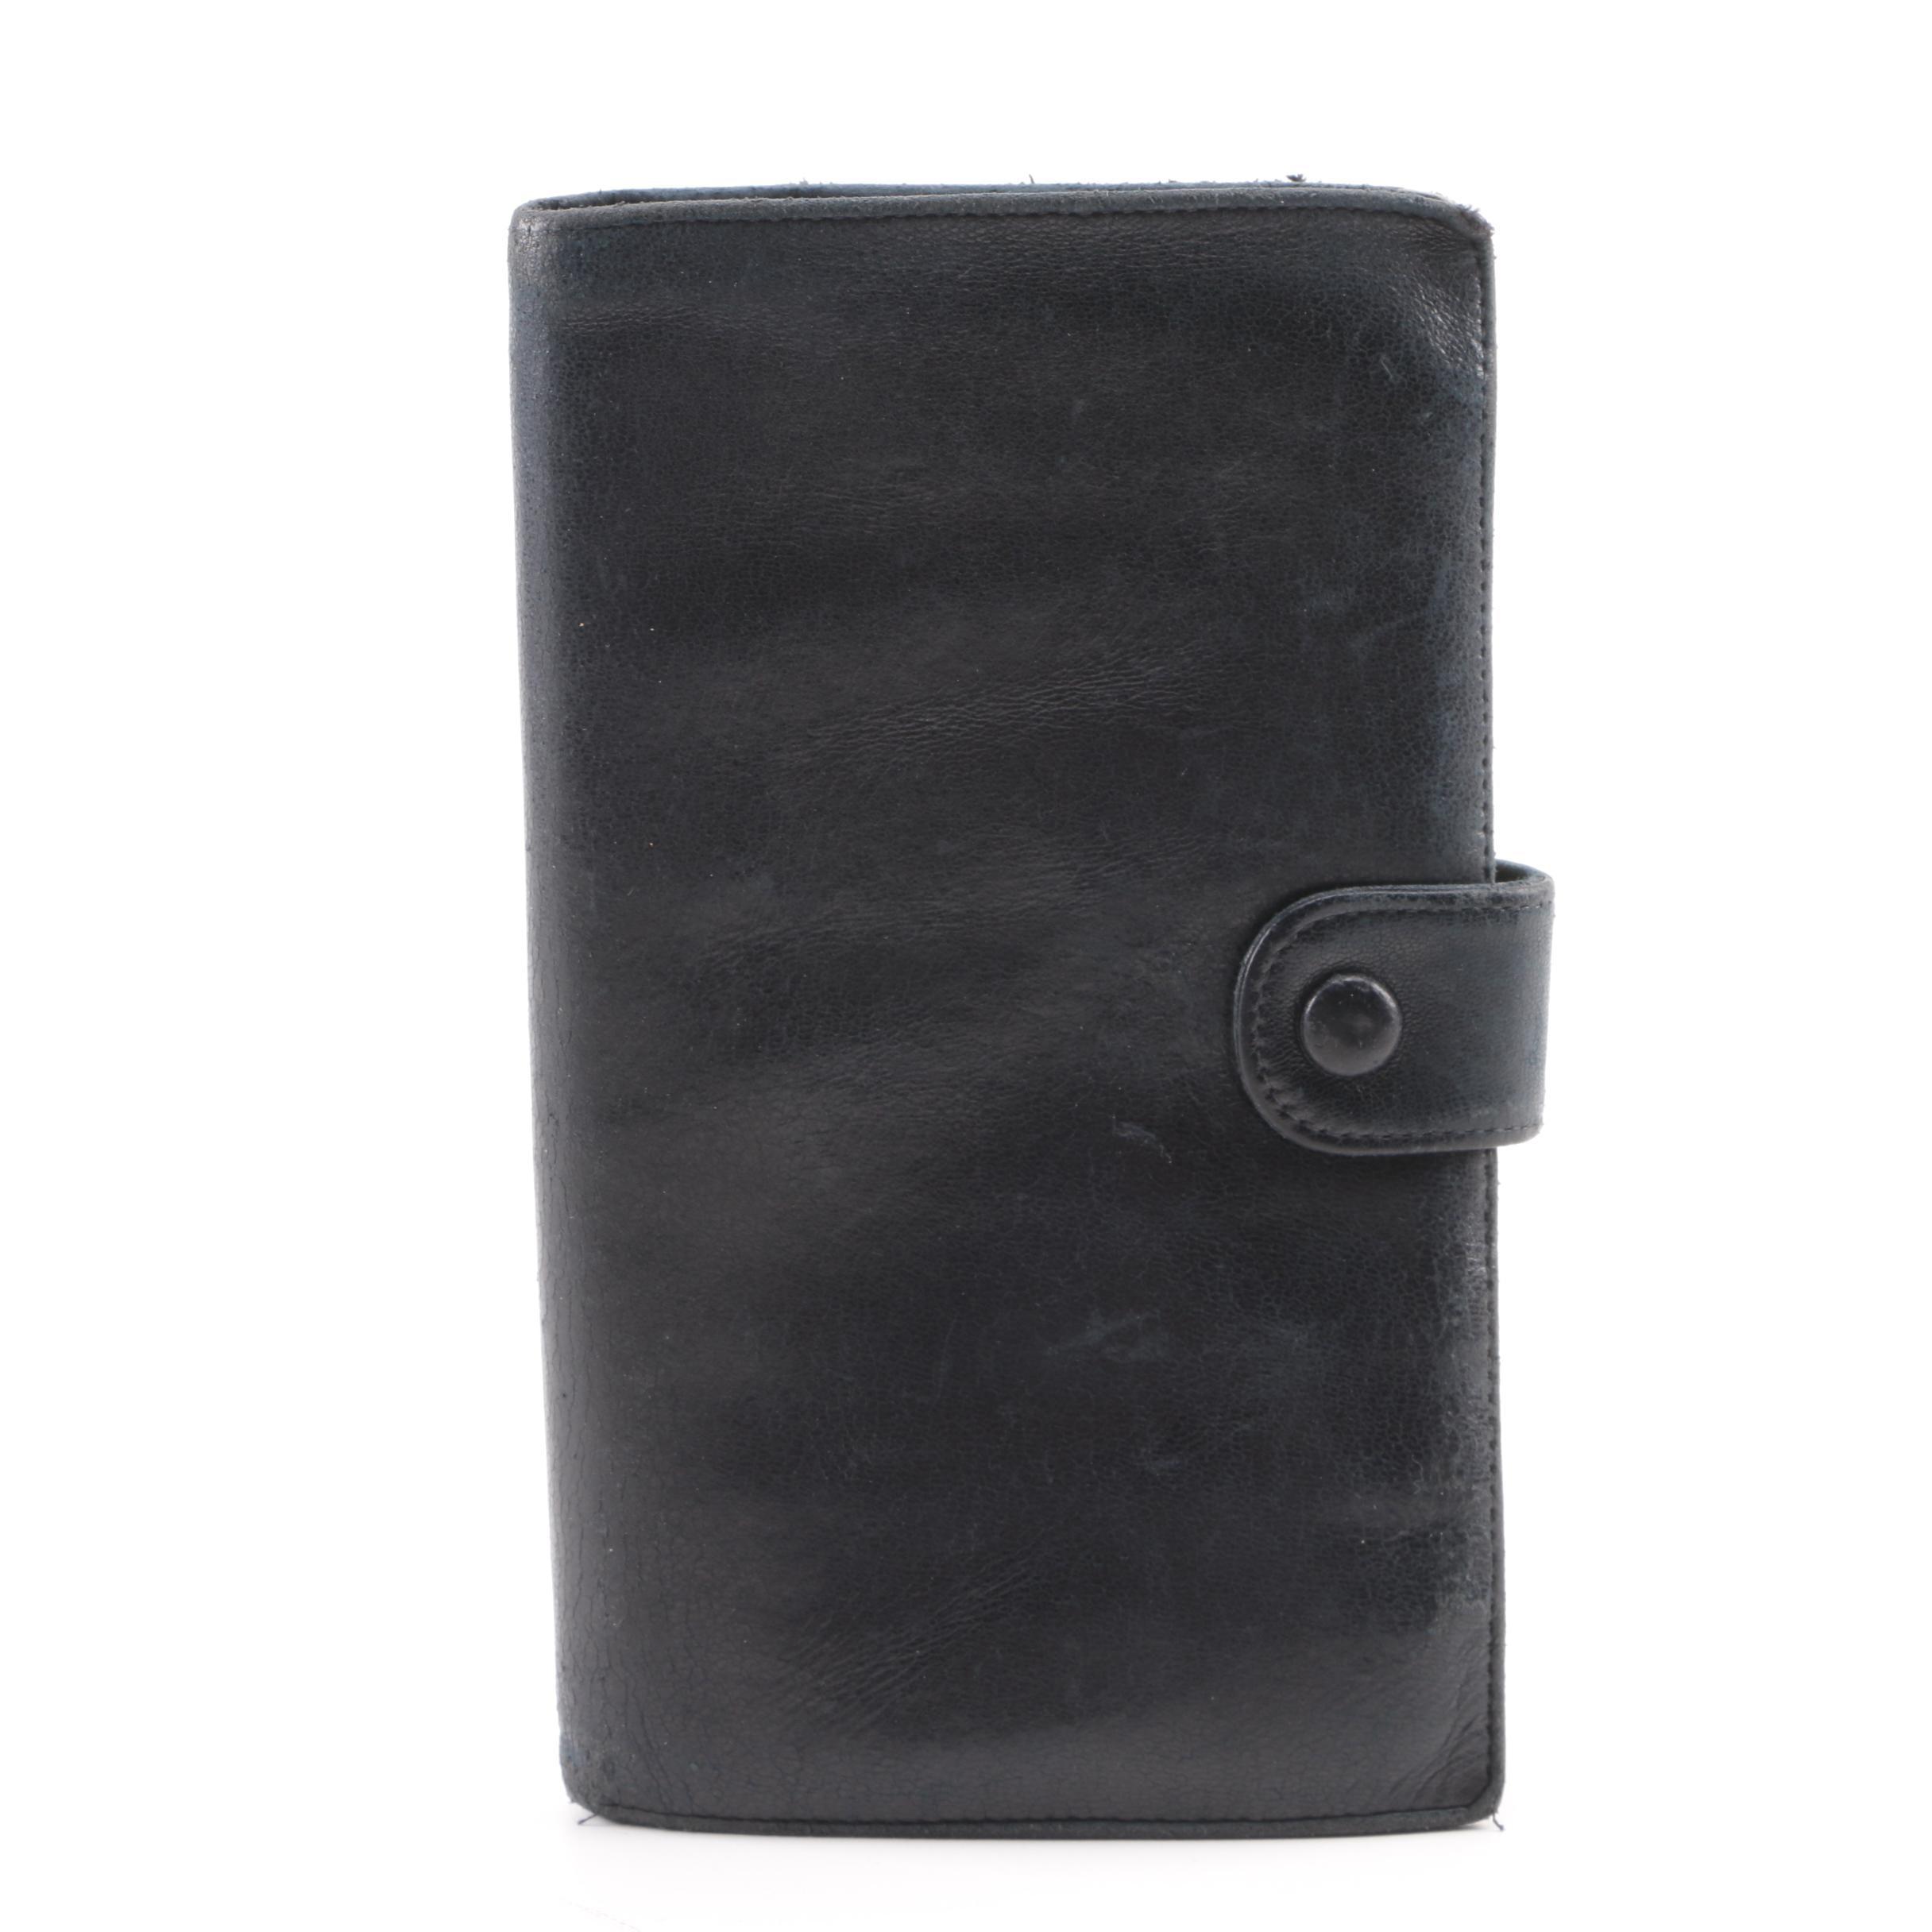 Chanel Black Leather Bifold Wallet